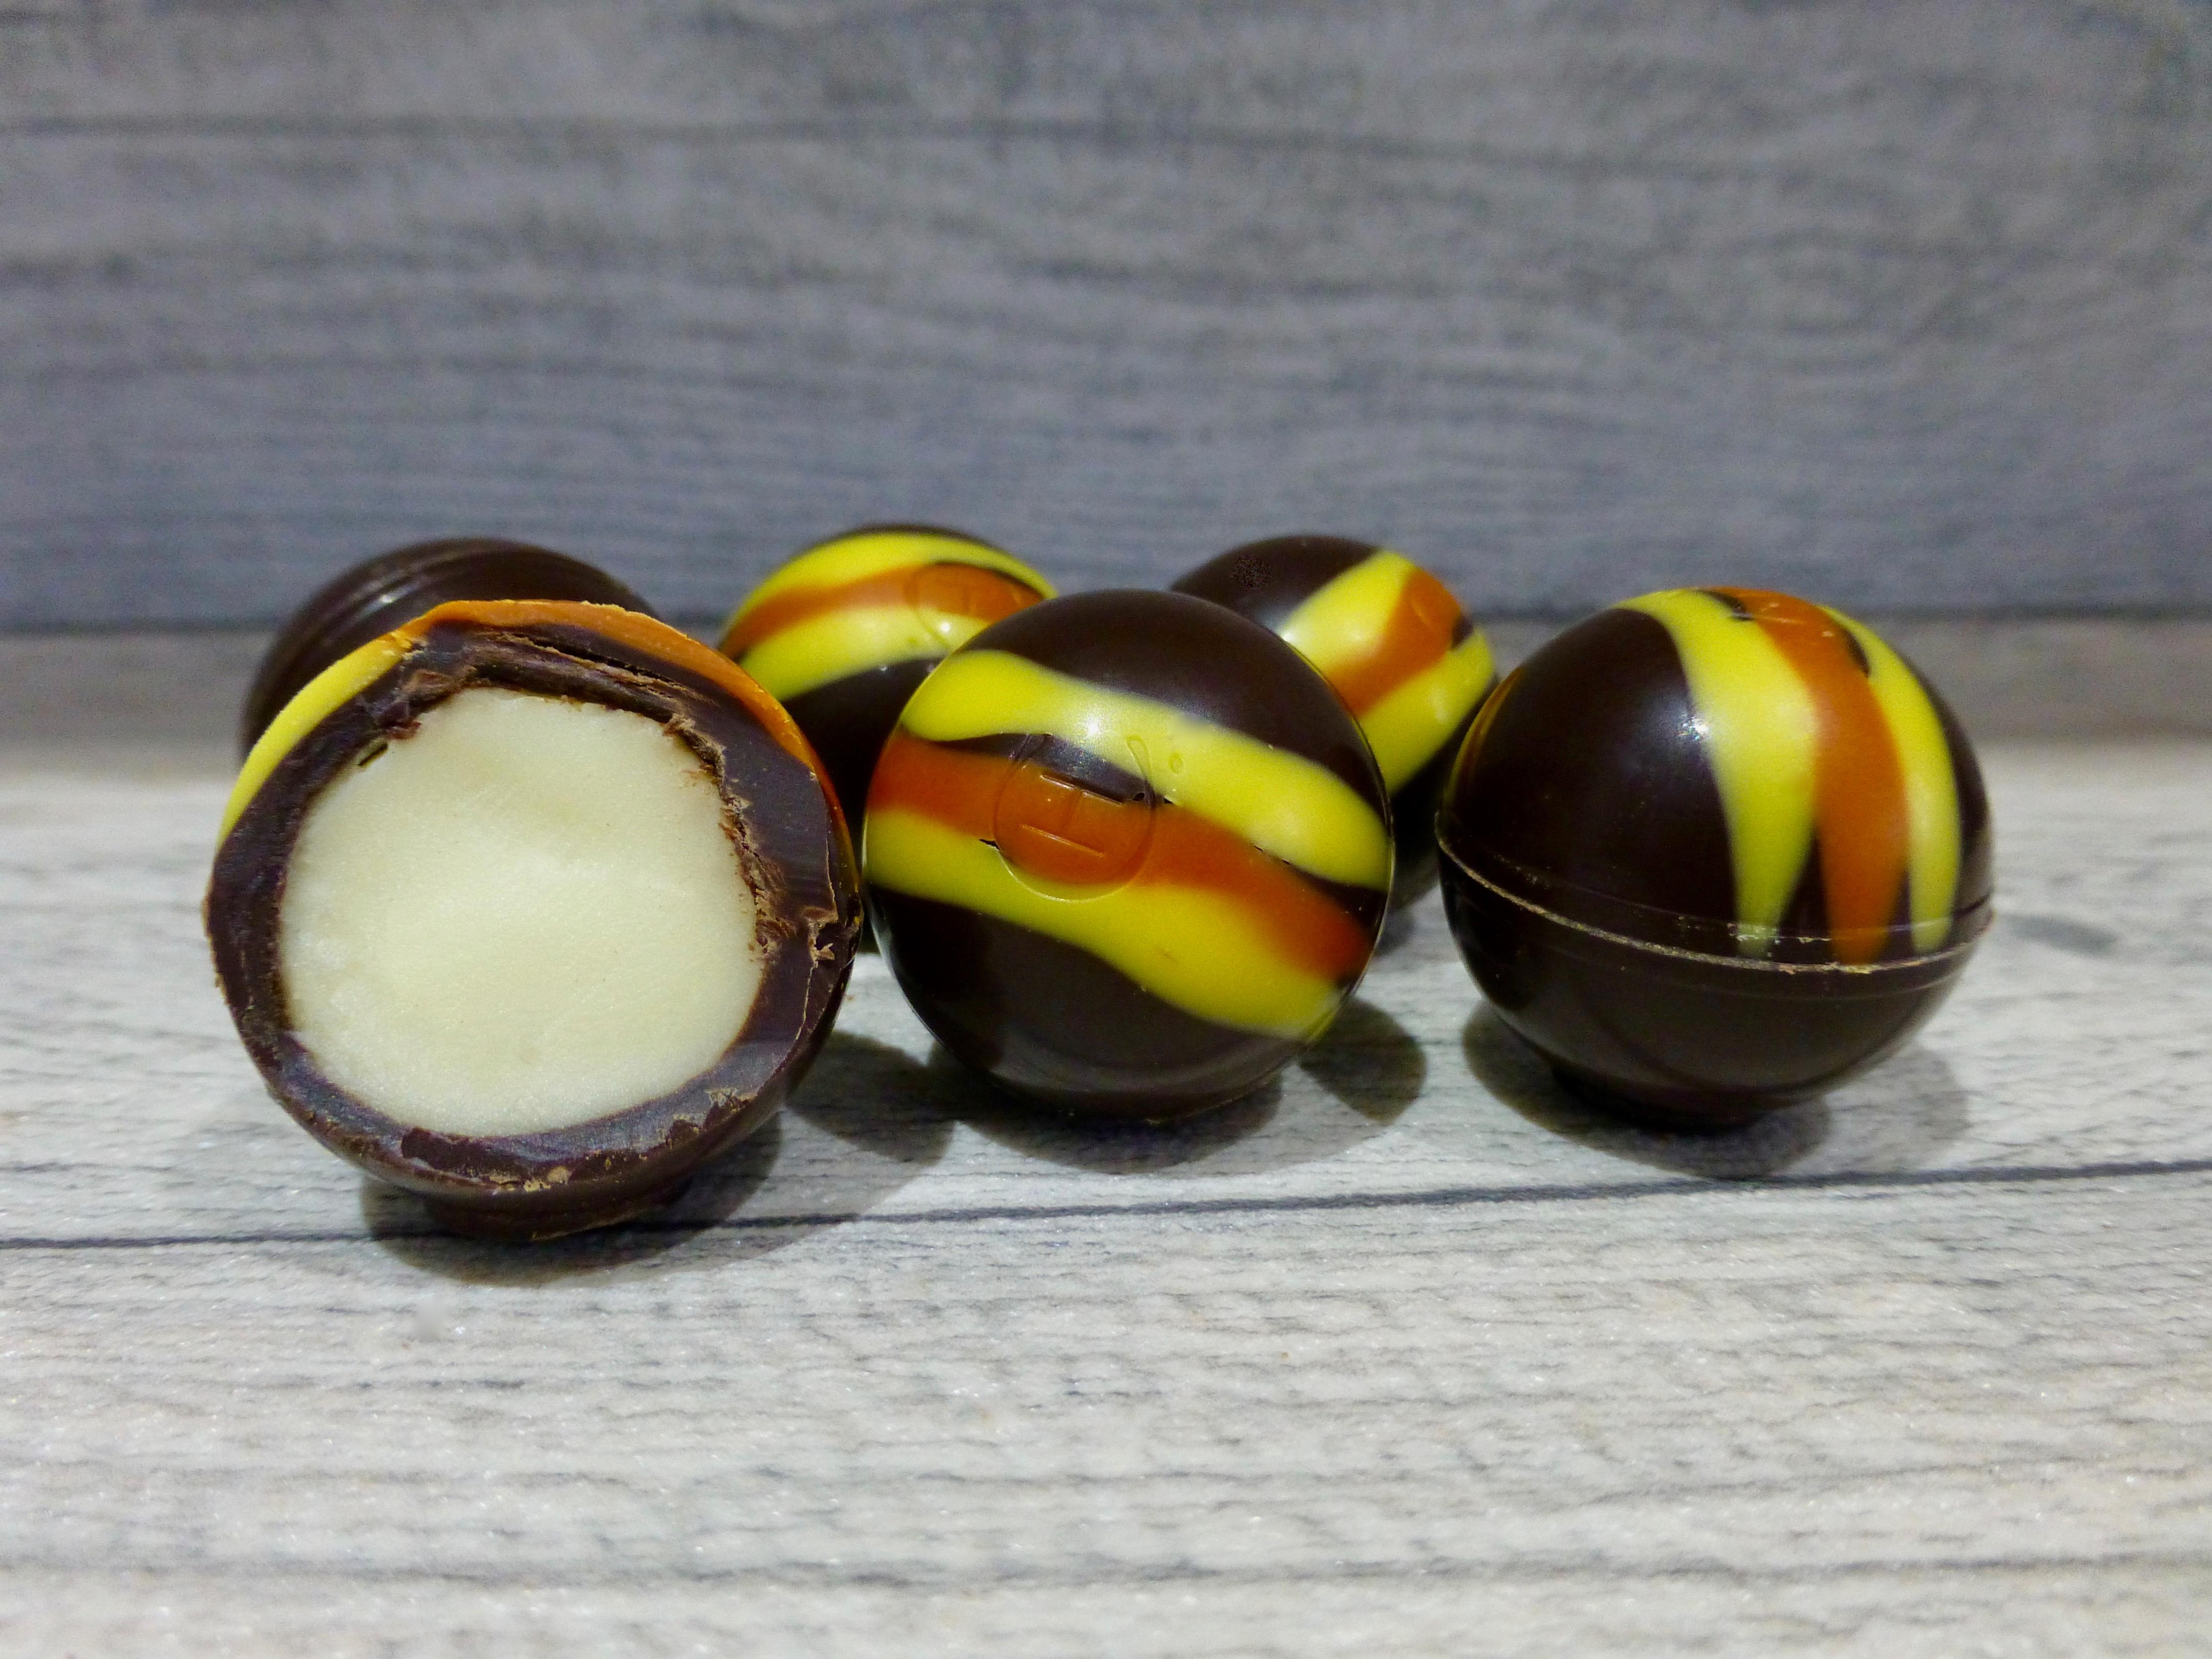 Hotel Chocolat Lady Marmalade Gin Selector